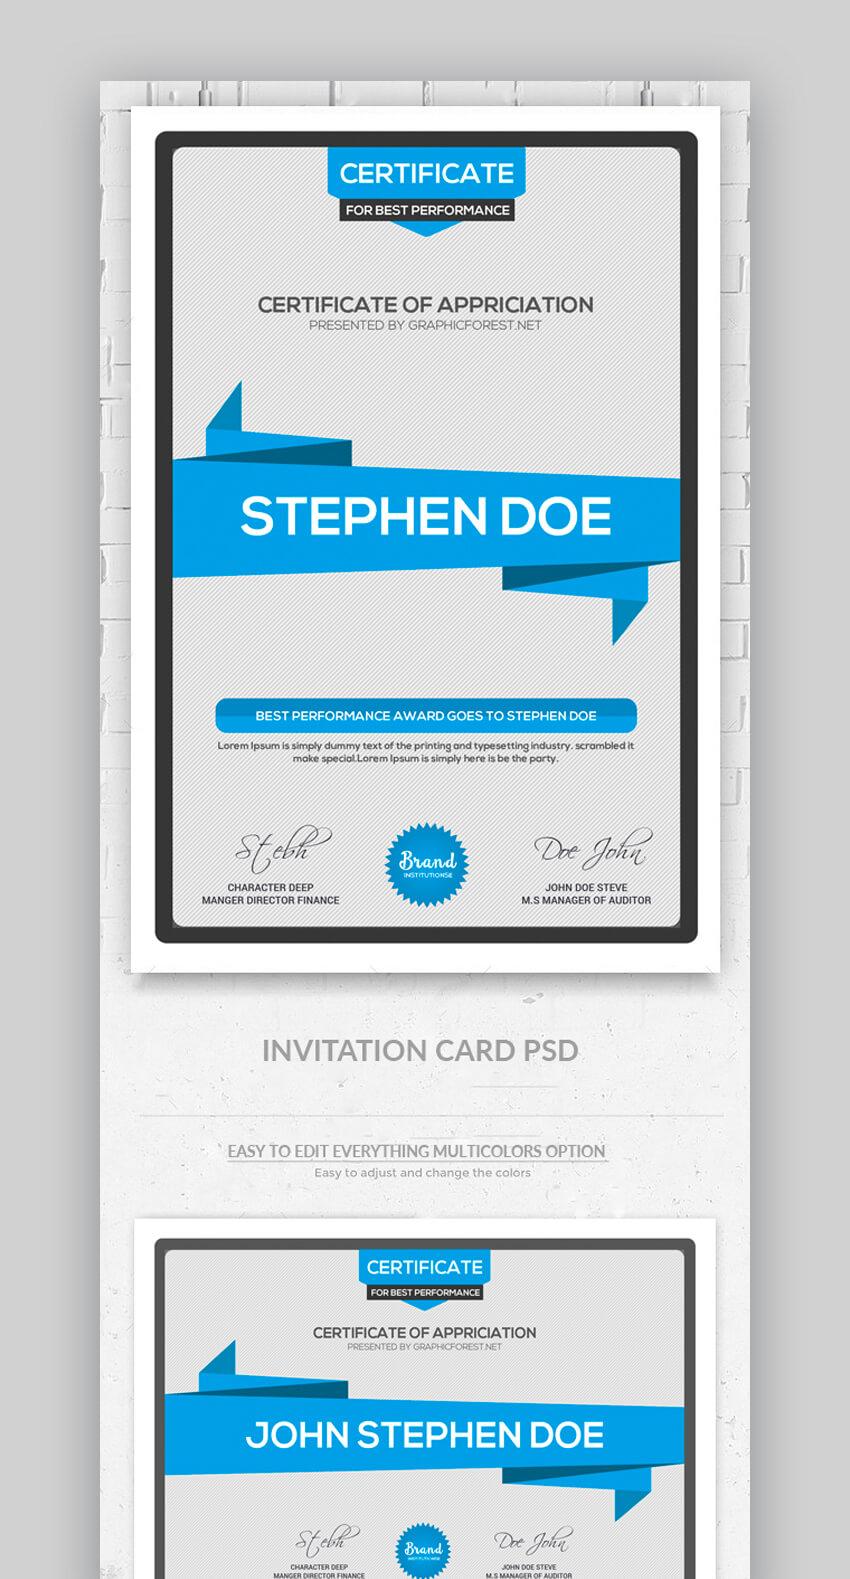 Certificate PSD